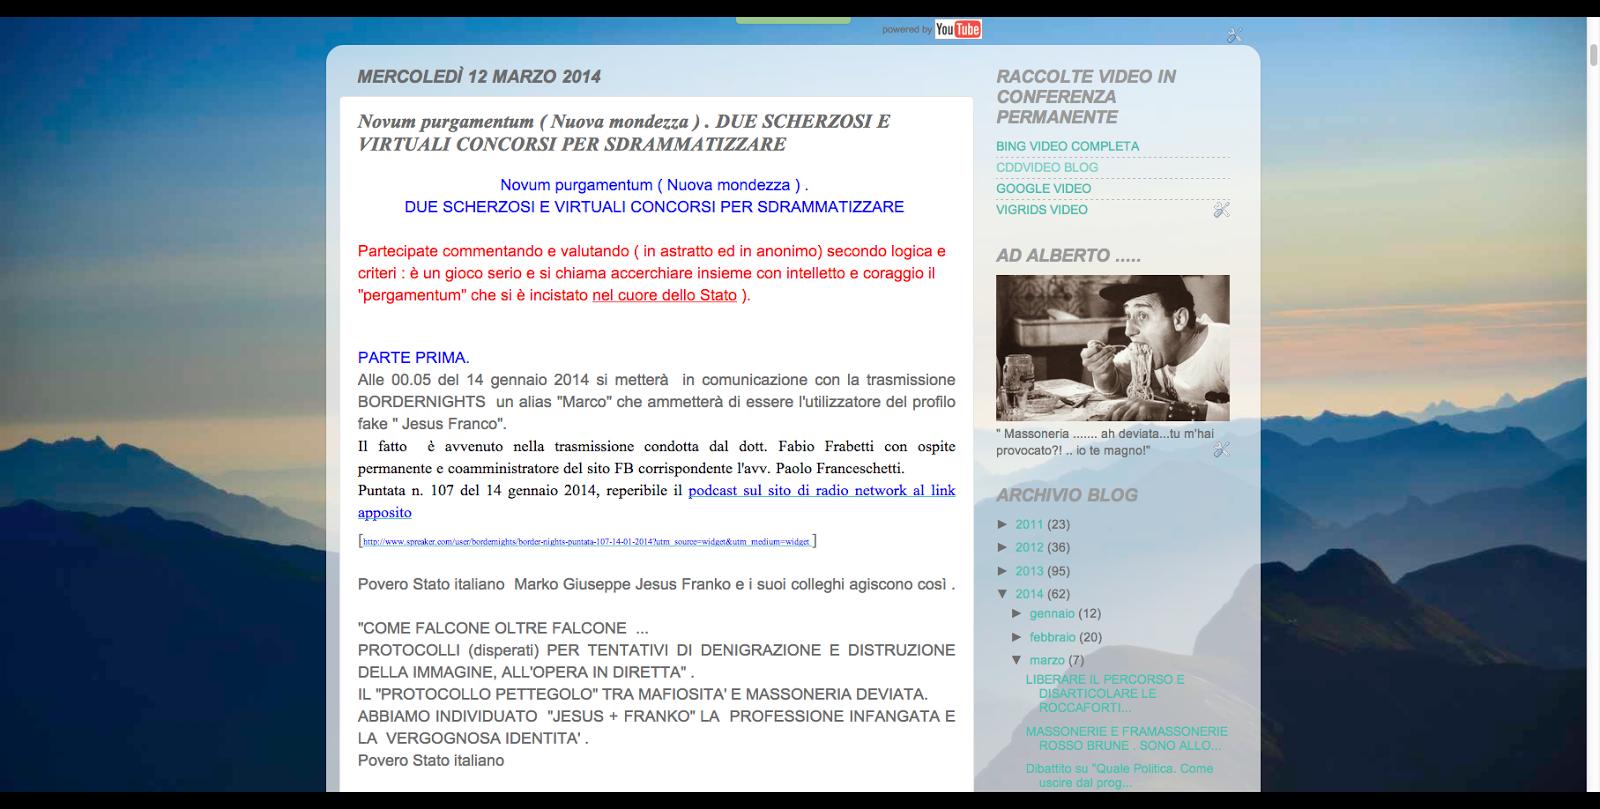 http://paoloferrarocdd.blogspot.it/2014/03/novum-purgamentum-nuova-mondezza-due.html